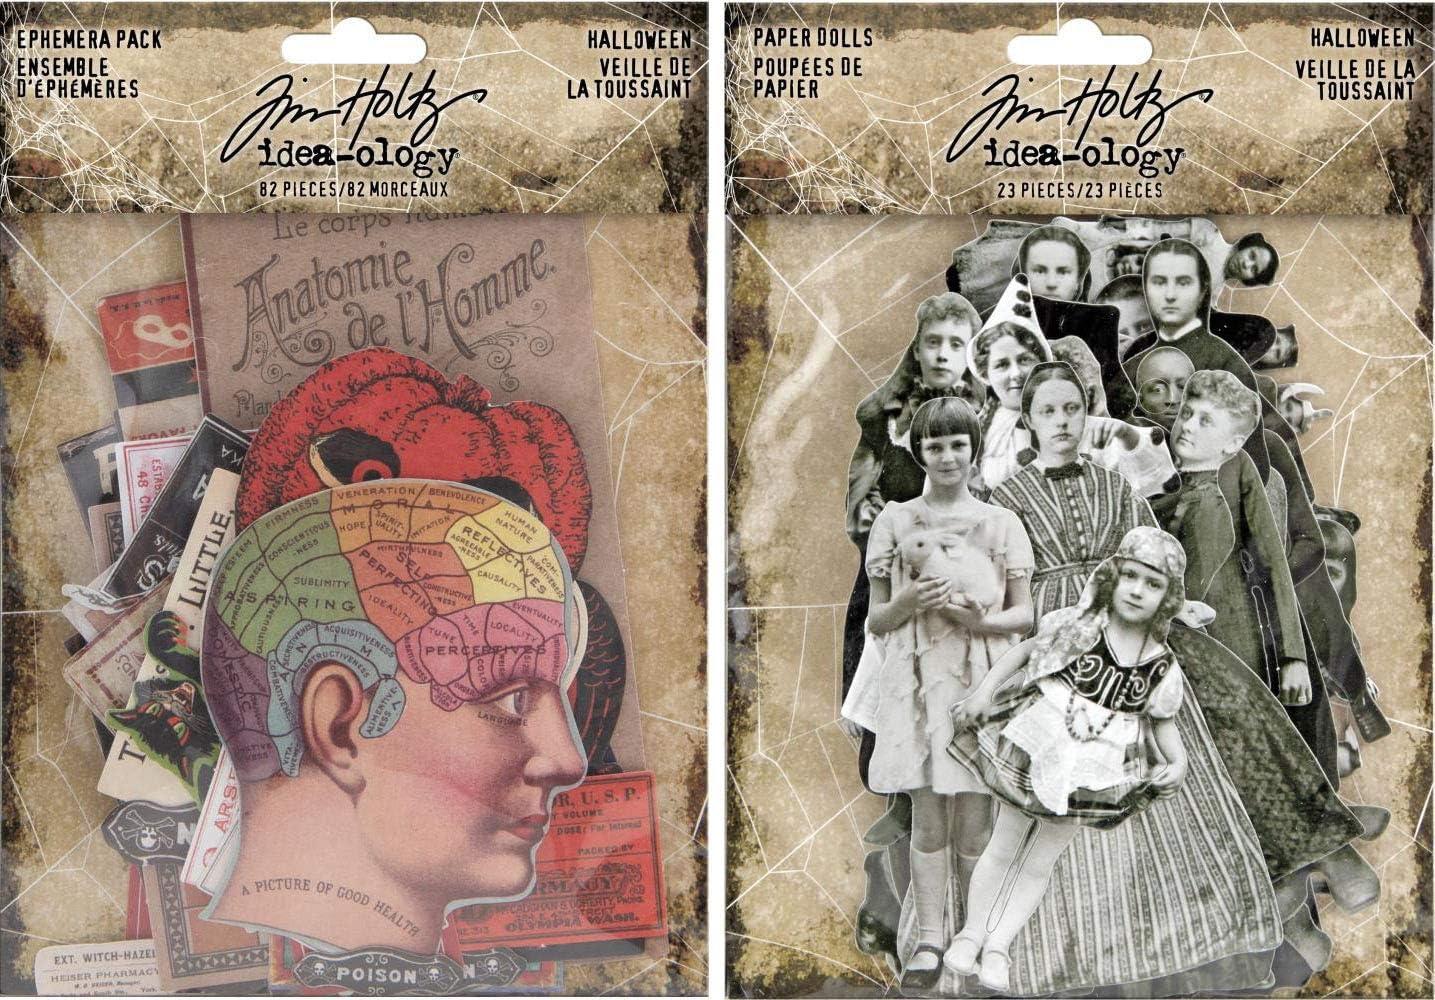 Tim Holtz Idea-Ology 2019 Halloween Ephemera and Halloween Paper Dolls - 2 Item Bundle